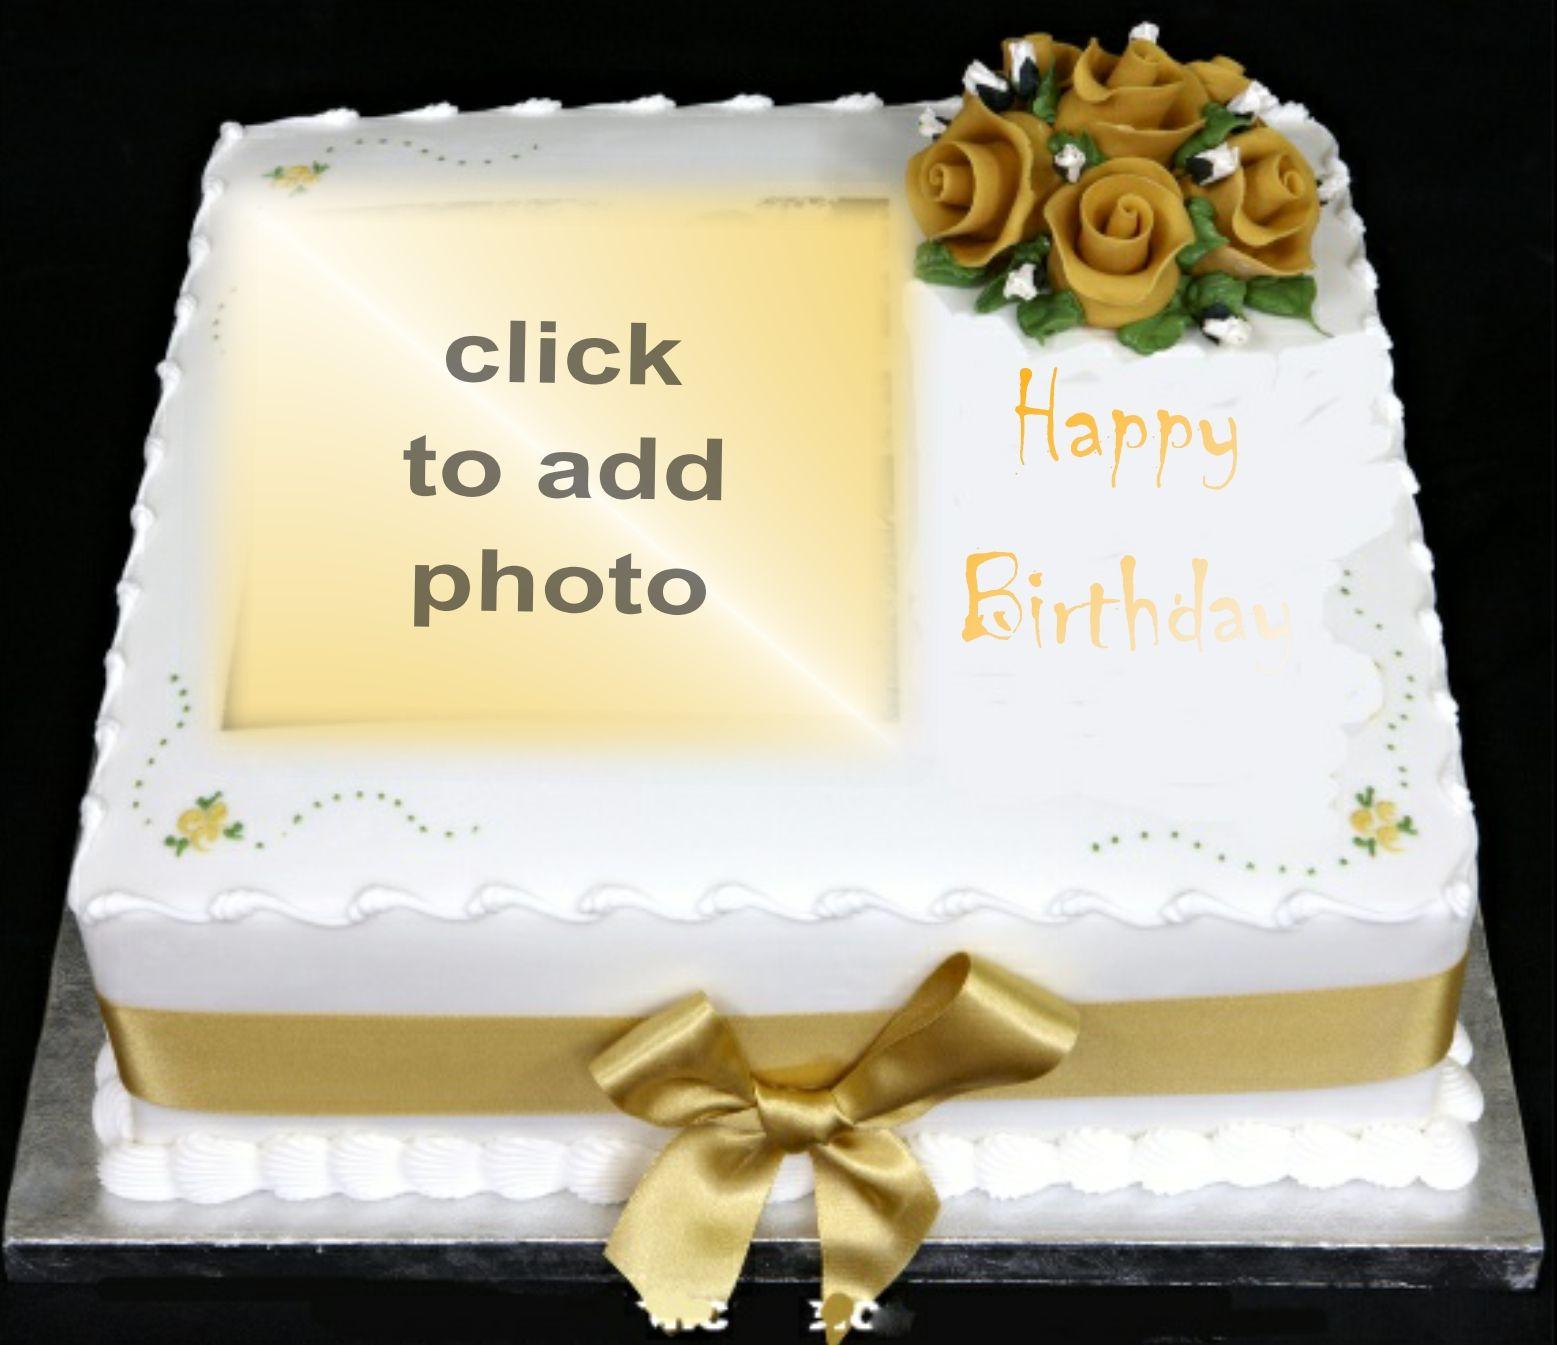 190 Happy Birthday Wishes Wallpaper 2019 ह प प